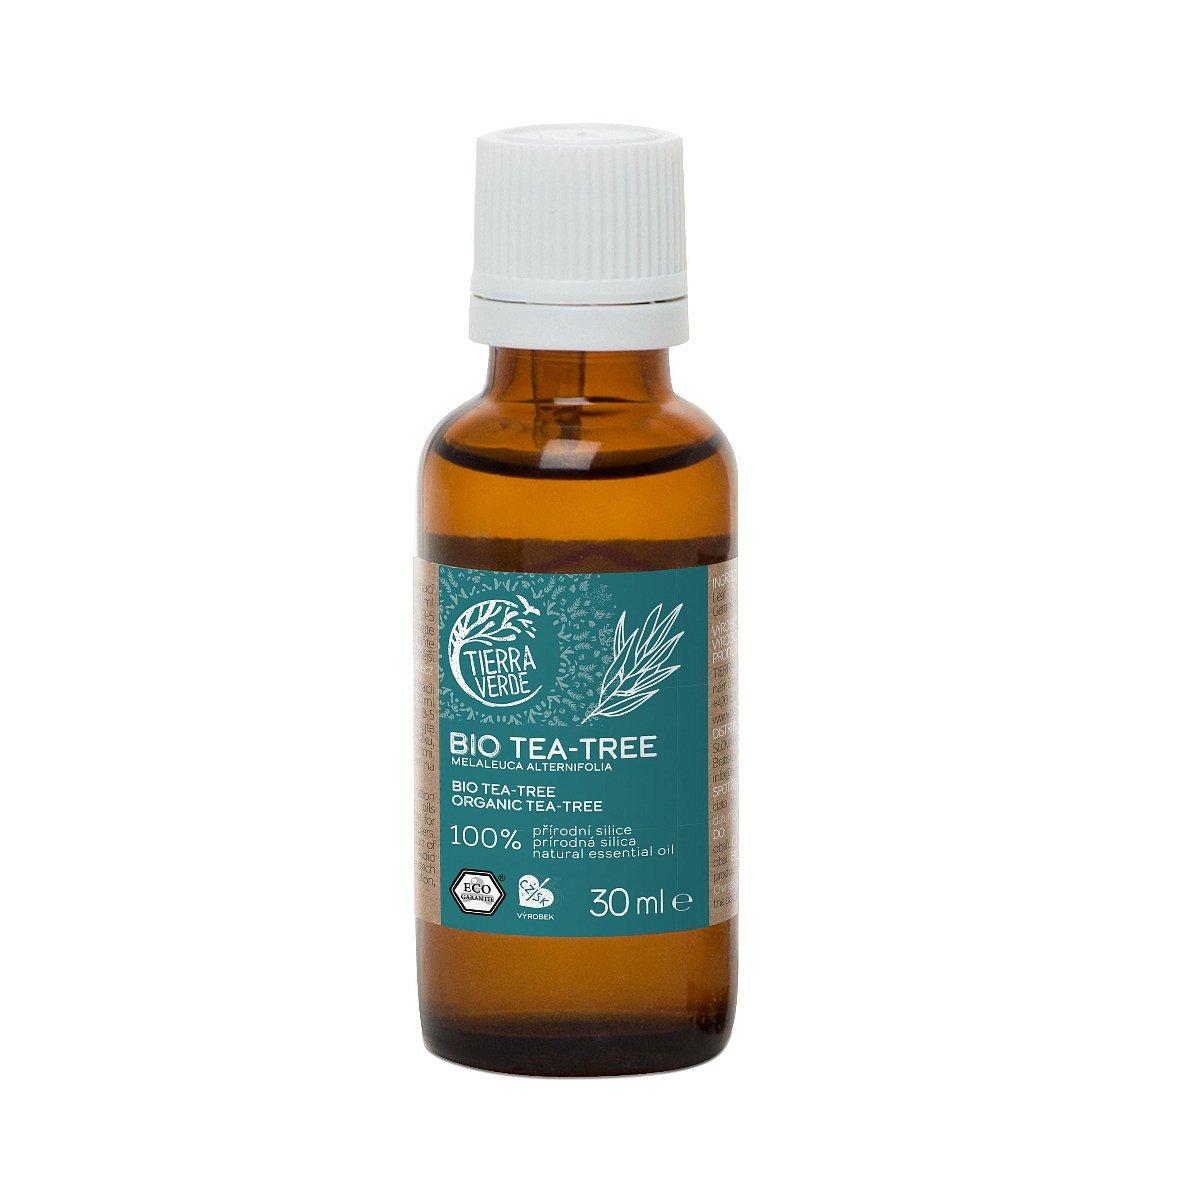 Tierra Verde Silice BIO Tea-Tree 30 ml